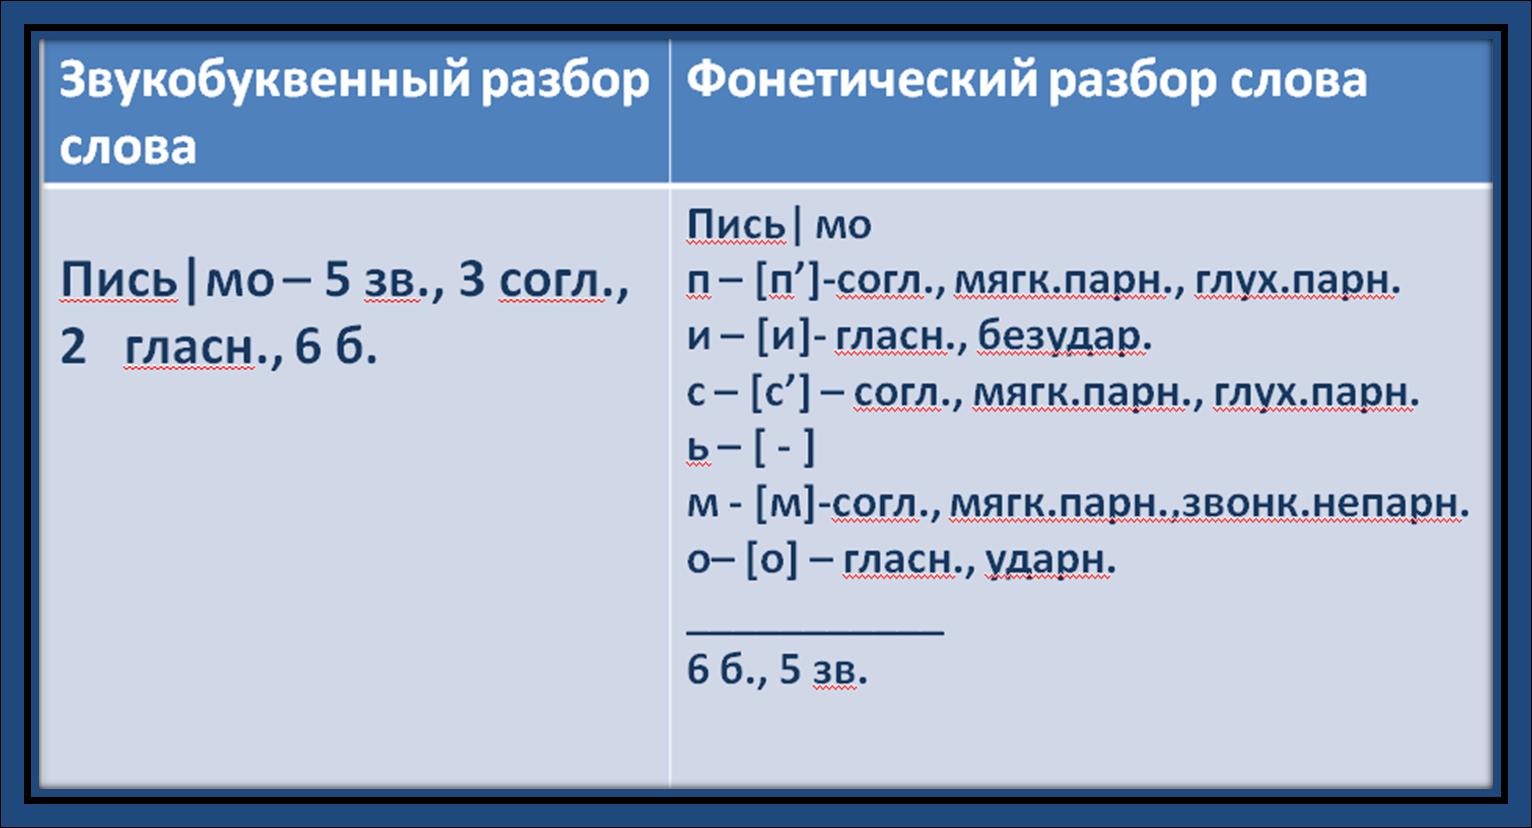 Фонетический разбор слова хвост 5 фотография